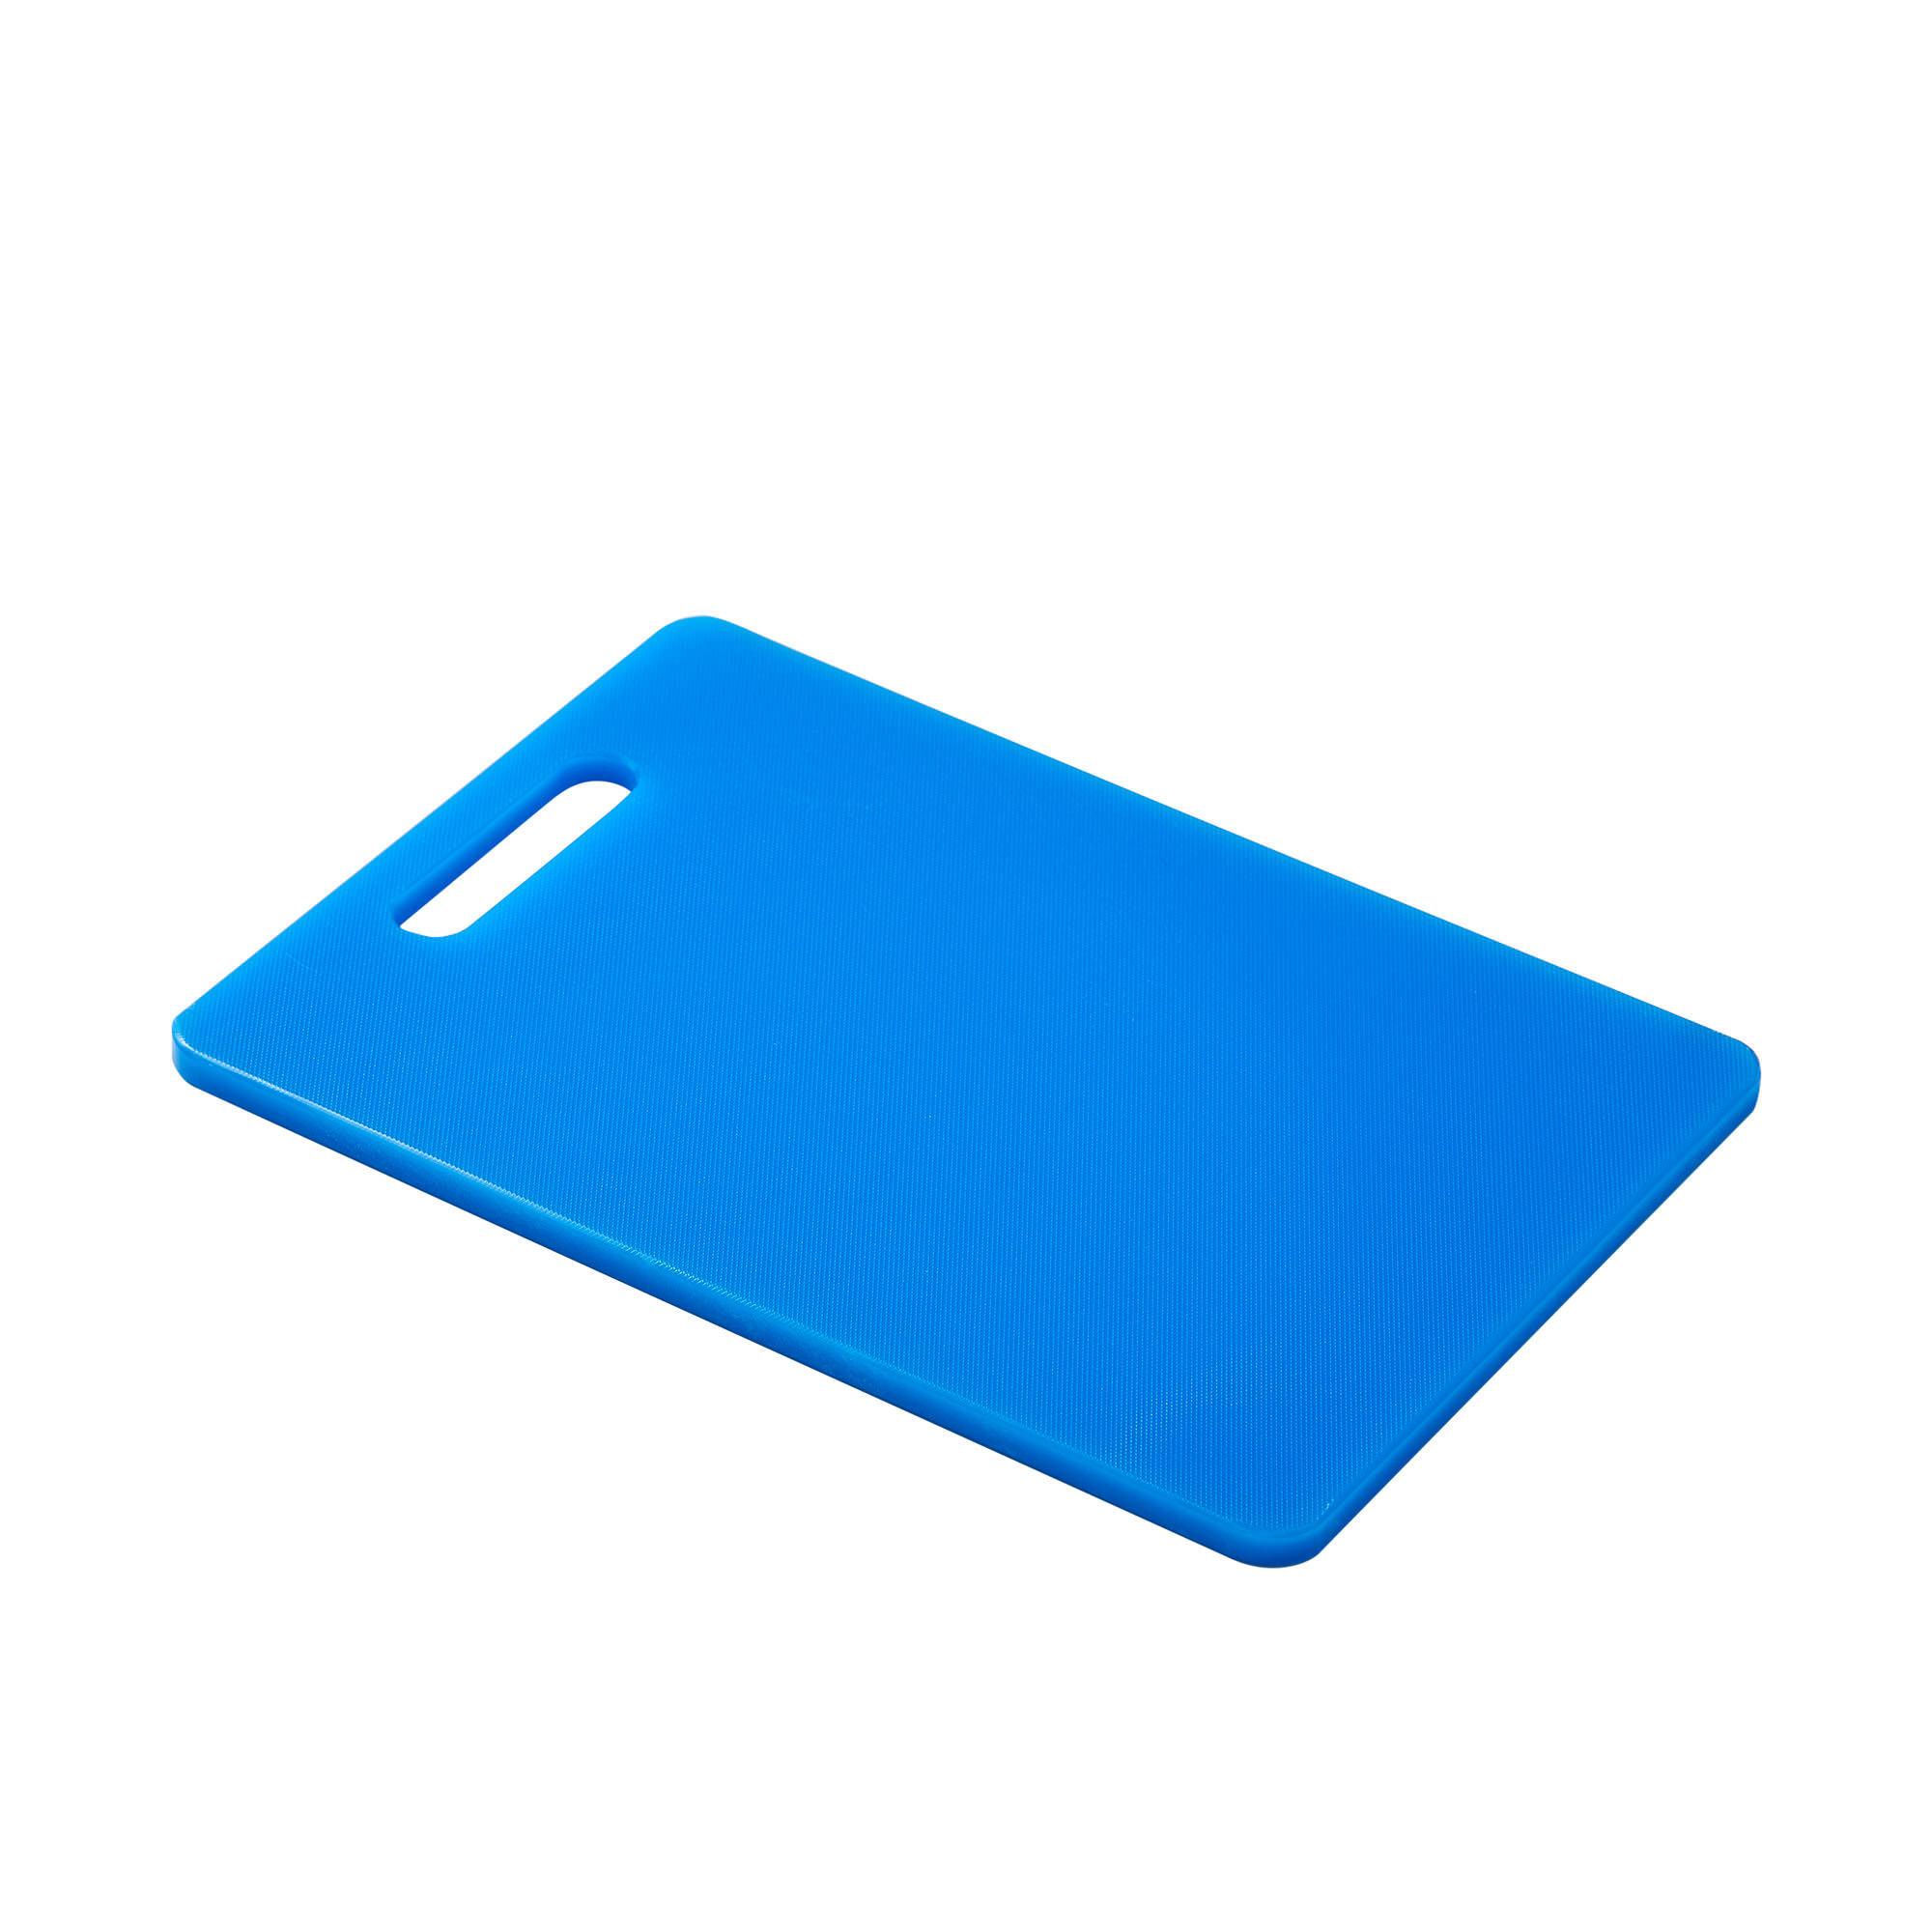 Kitchen Pro Classic Cutting Board 36x25x1.2cm Blue